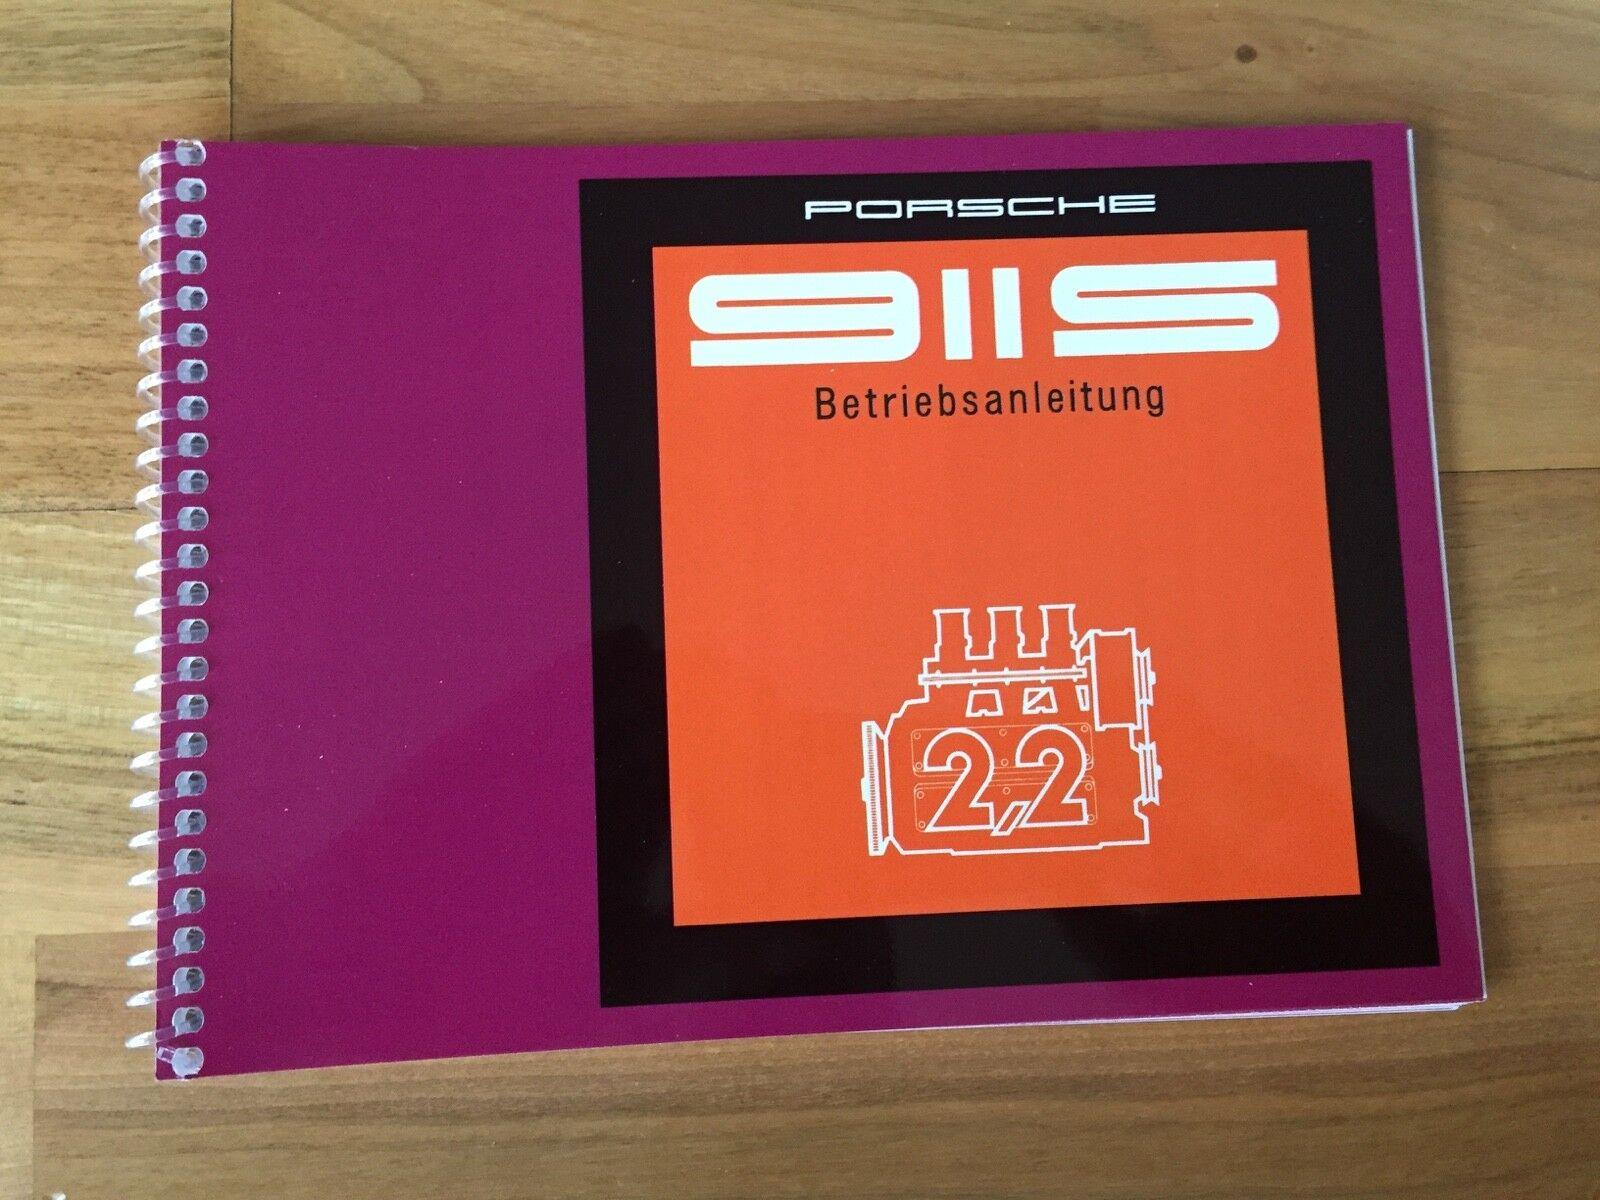 Porsche 911 s 2,2 manual de instrucciones de 70' 71' f modelo